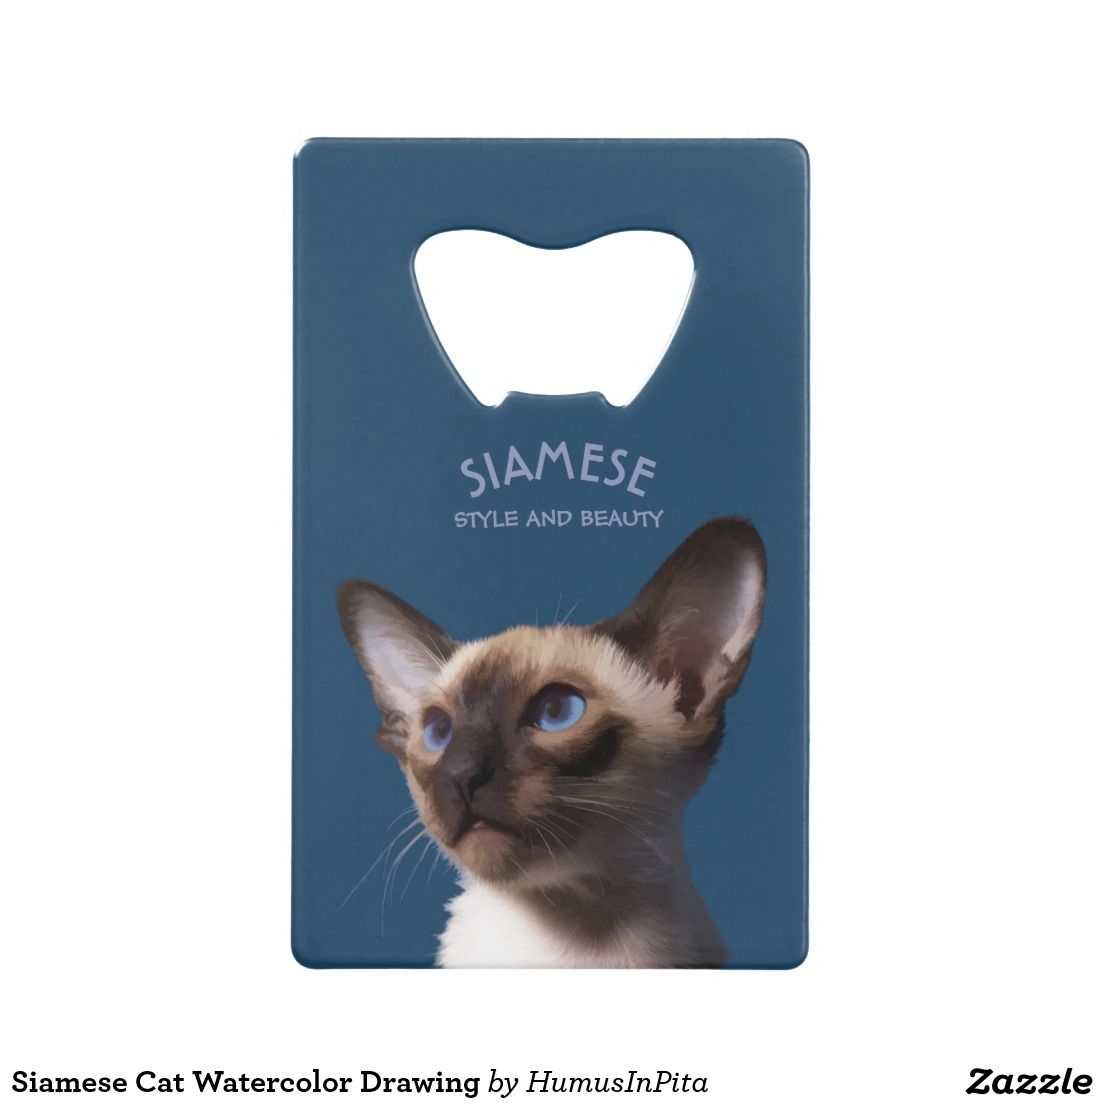 Siamese Cat Watercolor Drawing Wallet Bottle Opener